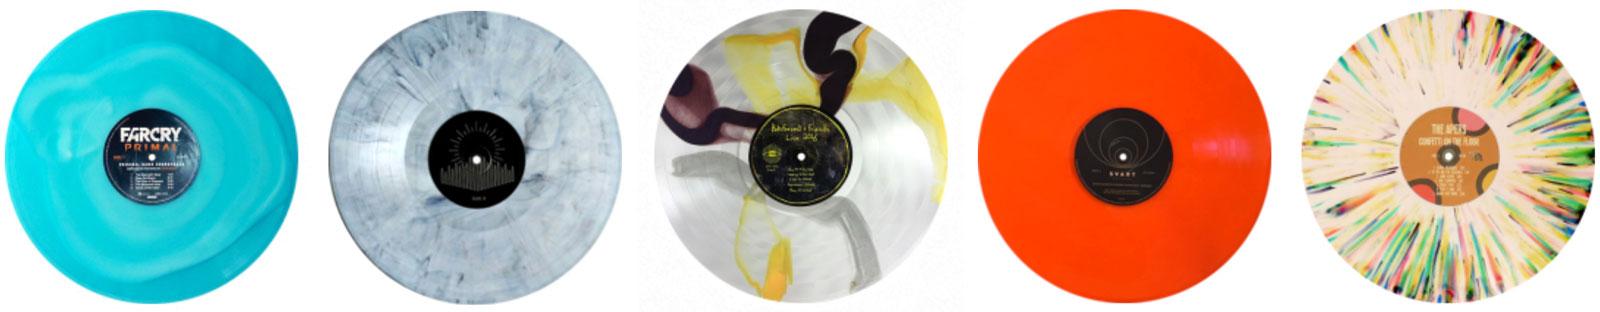 colored-vinyl-record-display.jpg